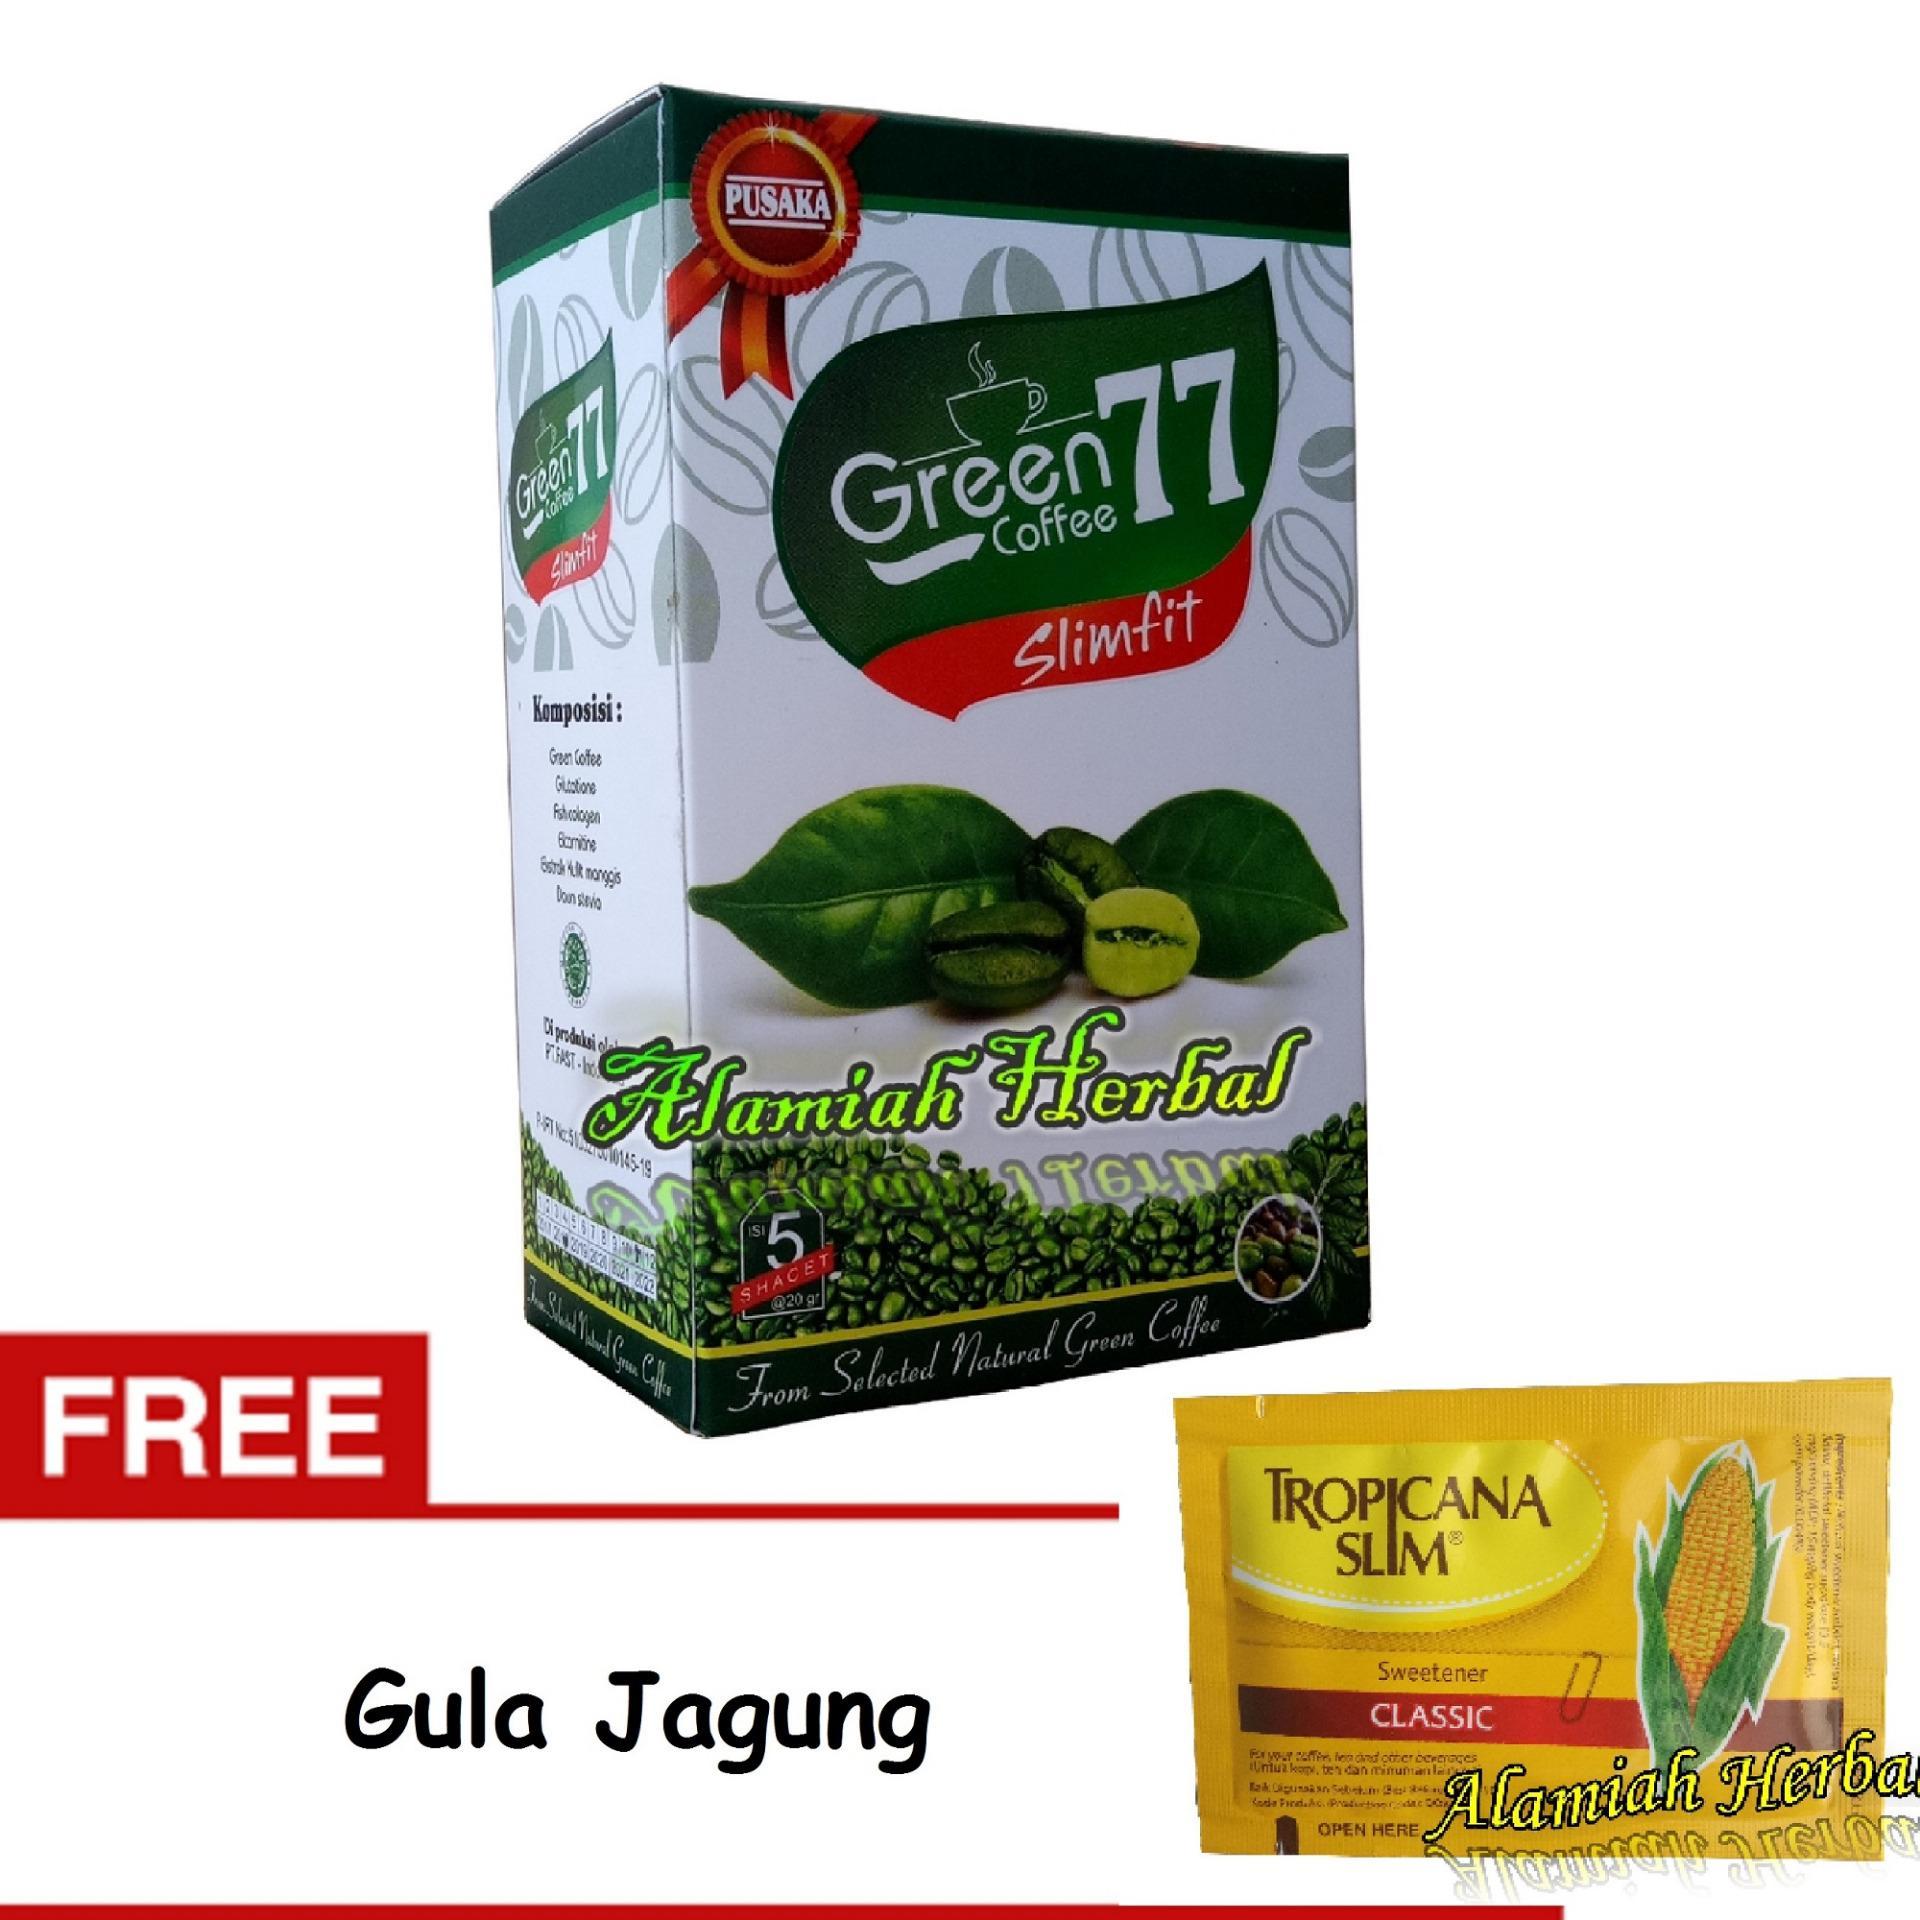 Flash Sale Green Coffee 77 Slimfit Minuman Kopi Hijau Diet Pelangsing - 5 sachet + Gula Jagung